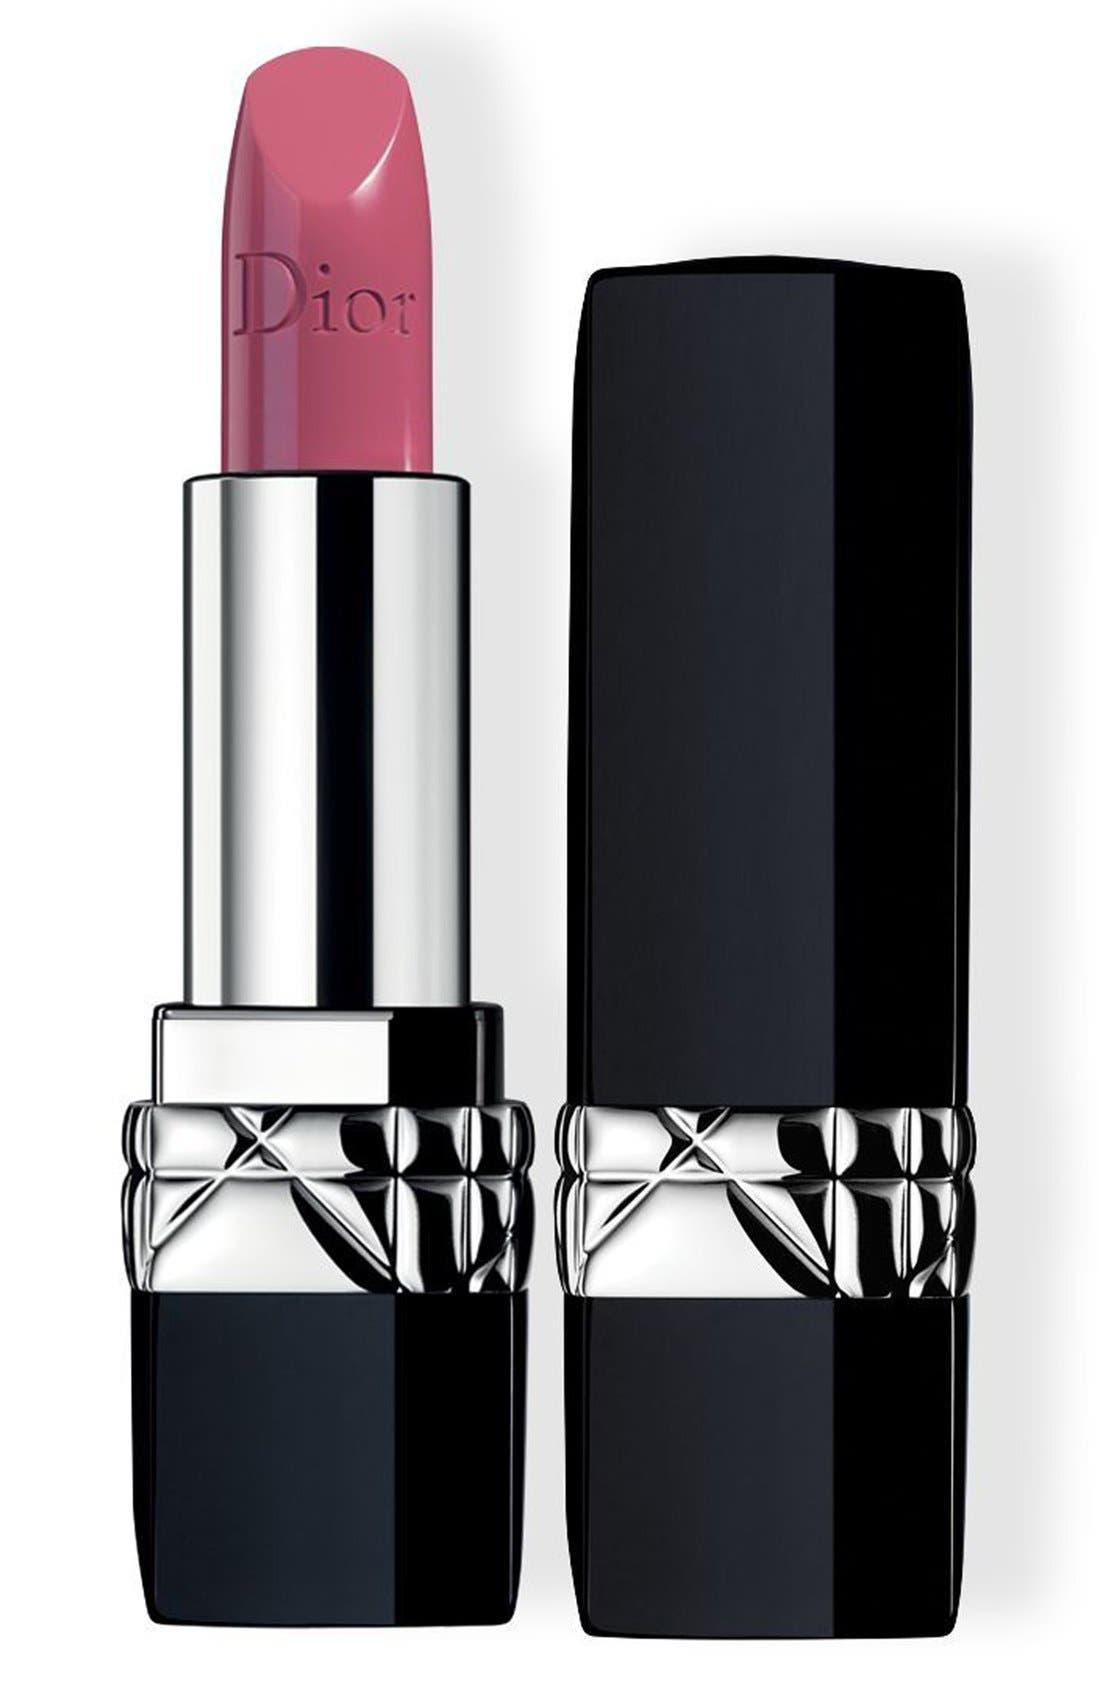 Dior Couture Color Rouge Dior Lipstick - 361 Rose Baiser